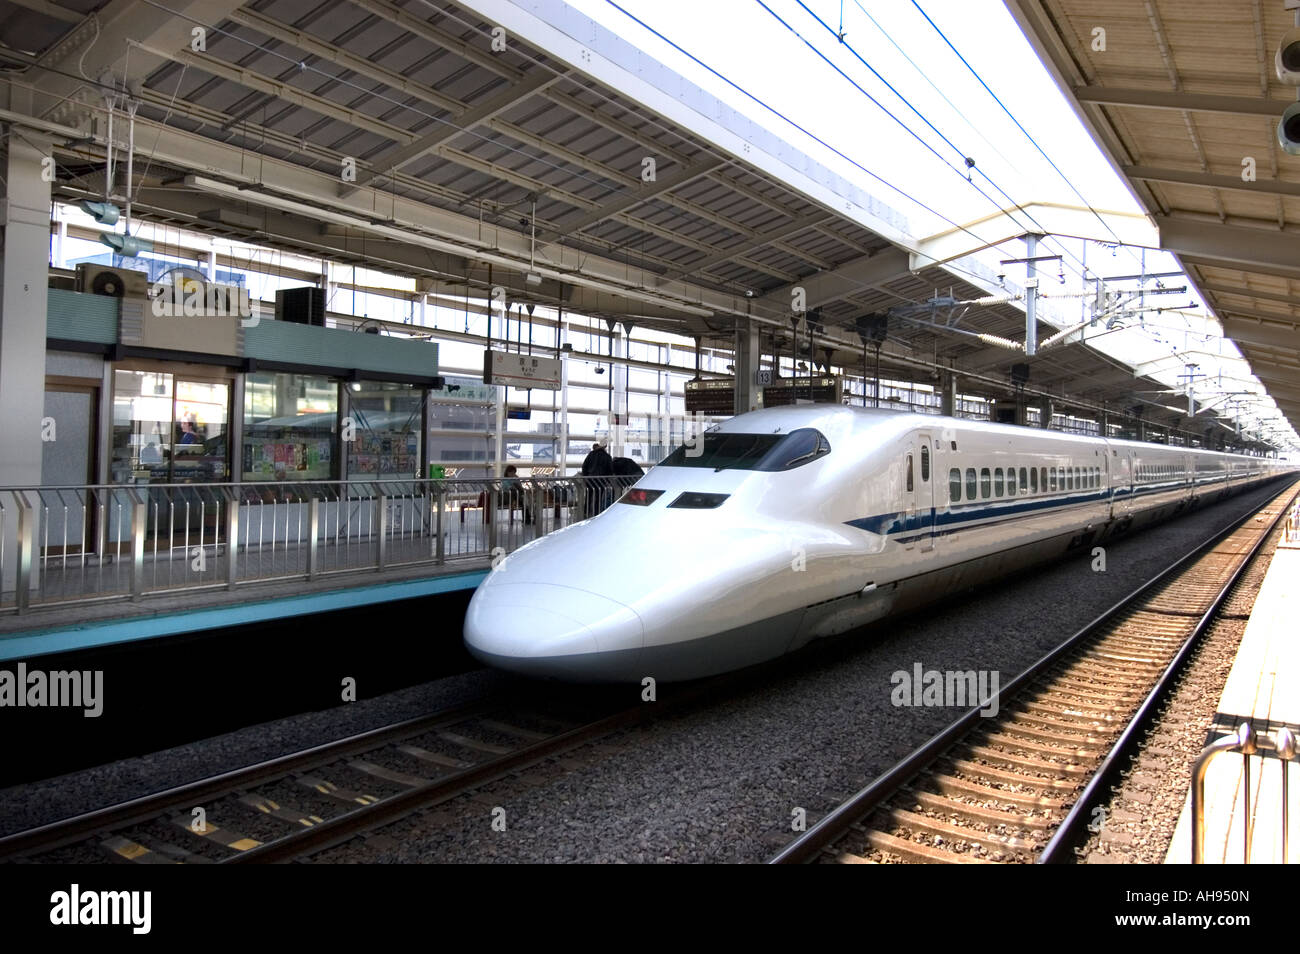 Tokyo train railway transport bullet train fast efficient japanese ...